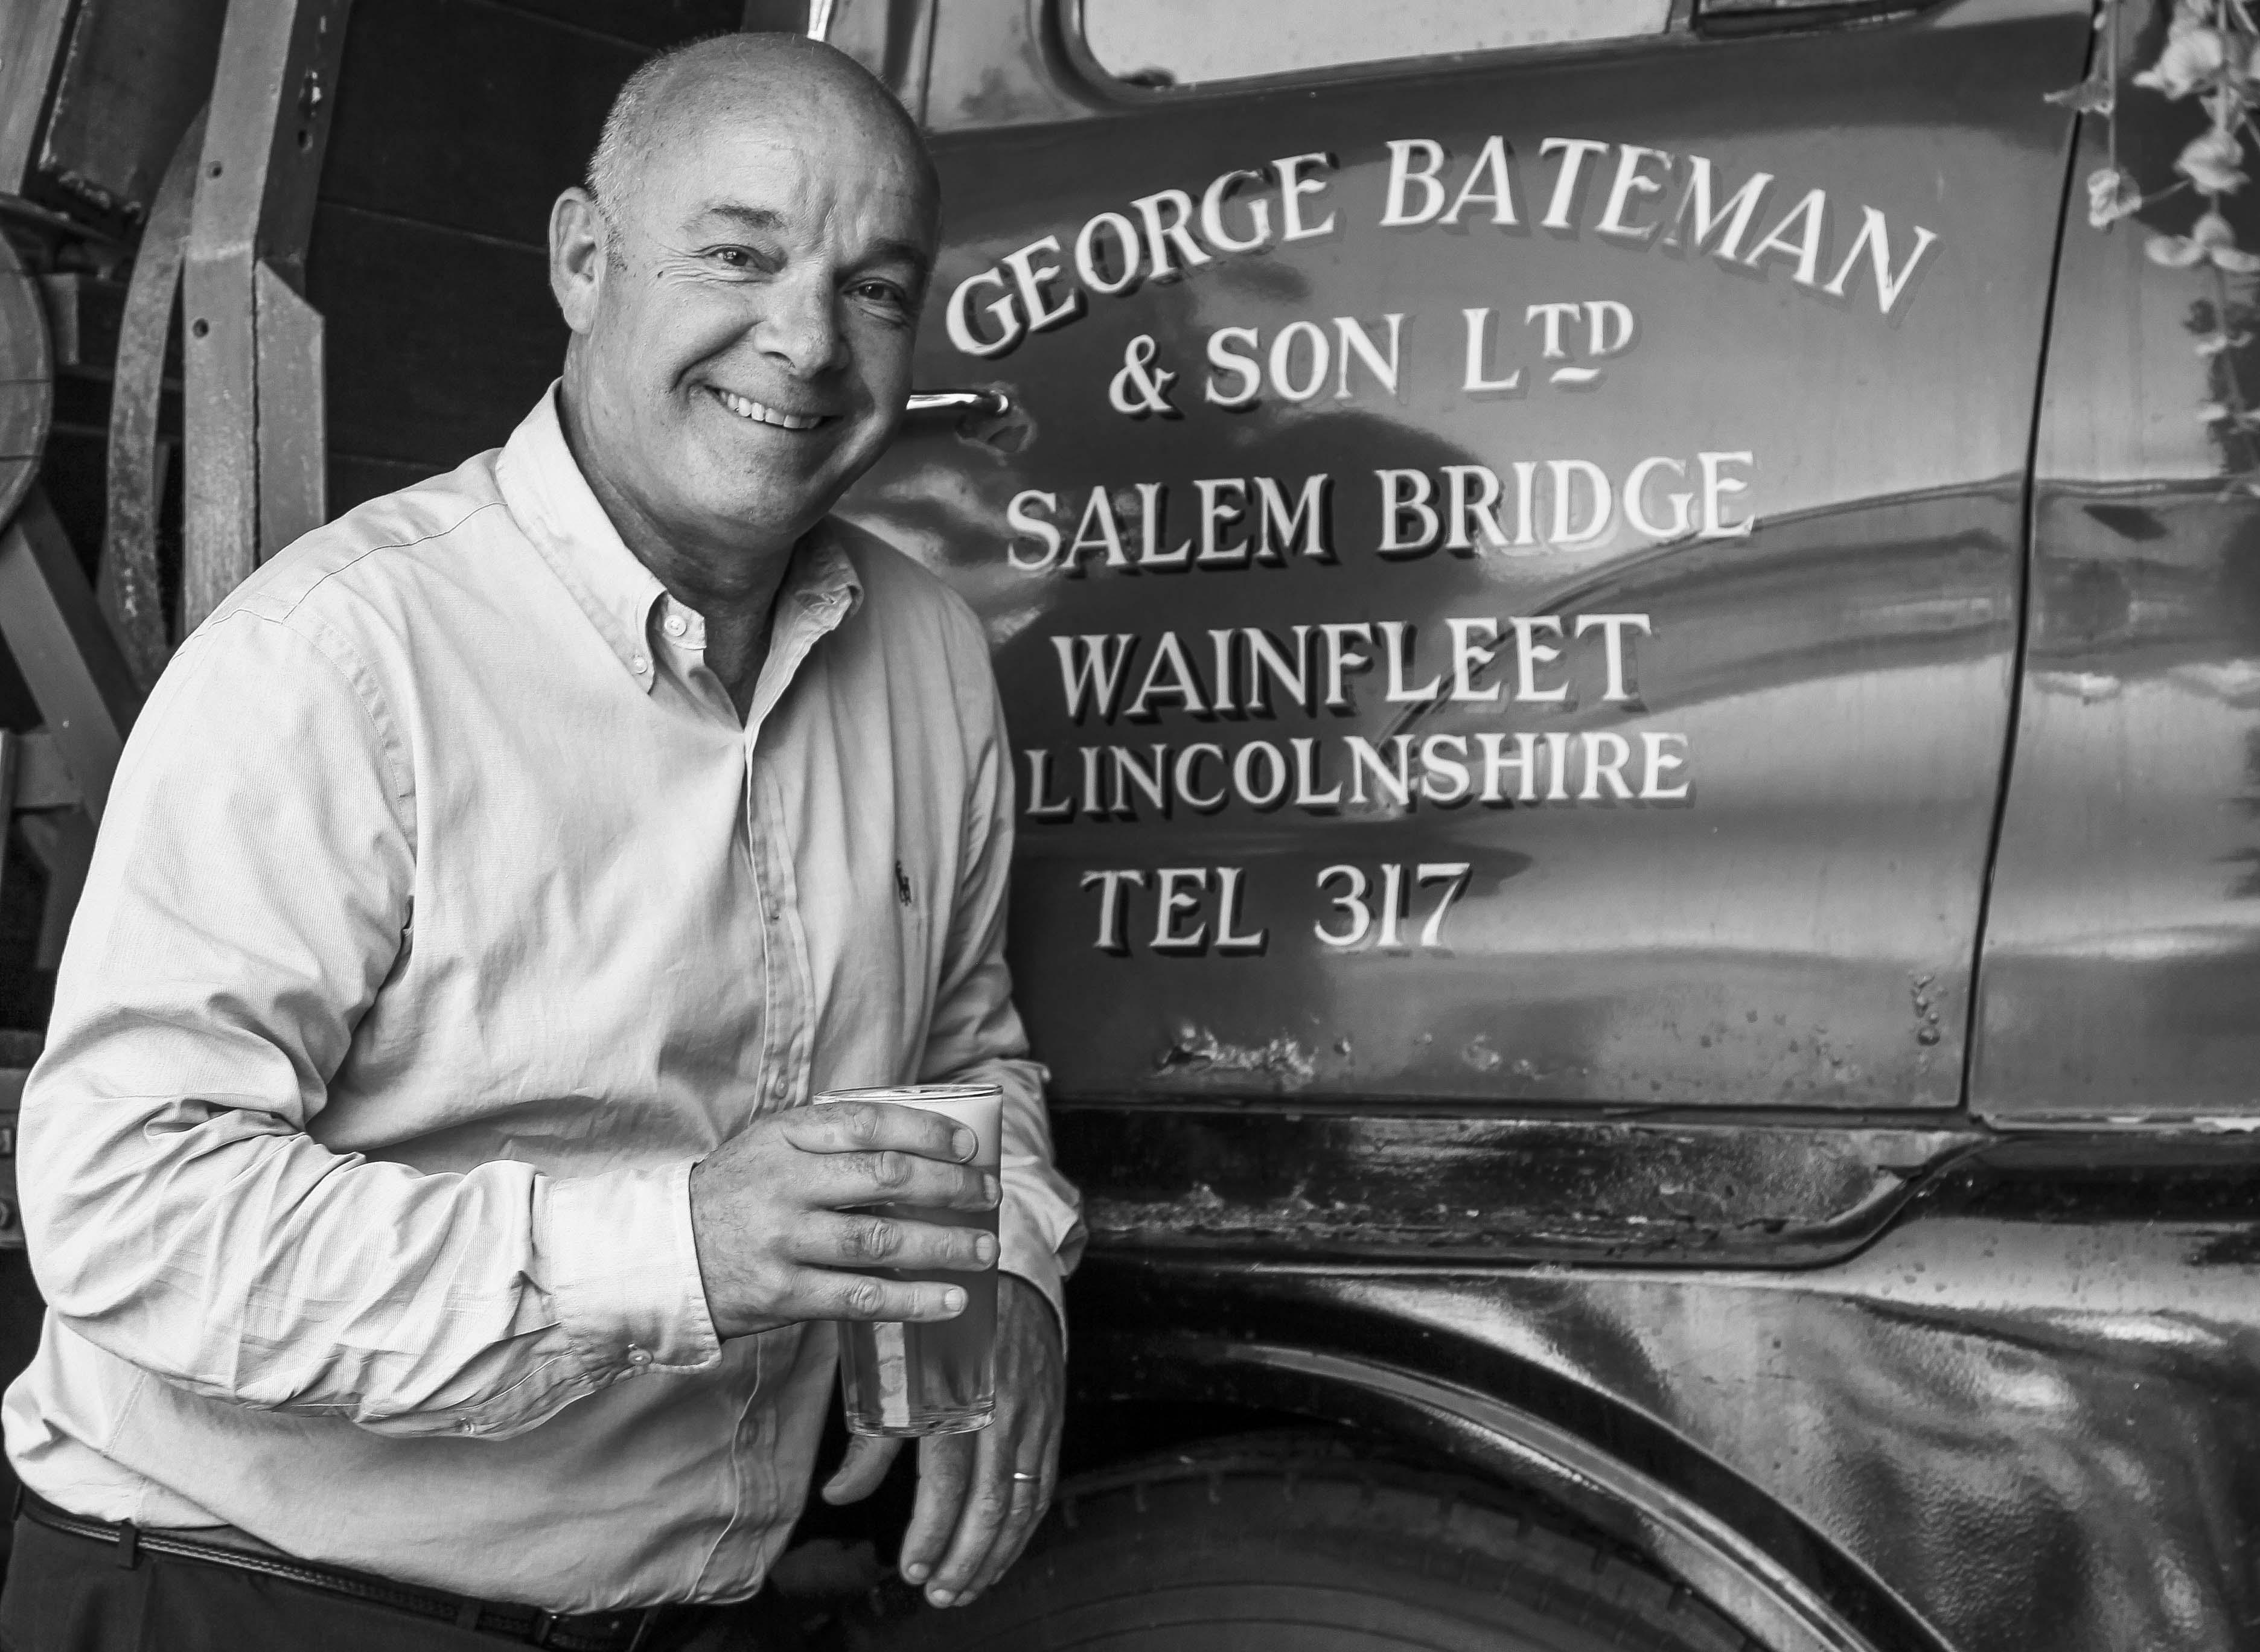 Stuart explains the heritage of his family's business at Salem Bridge, Wainfleet.